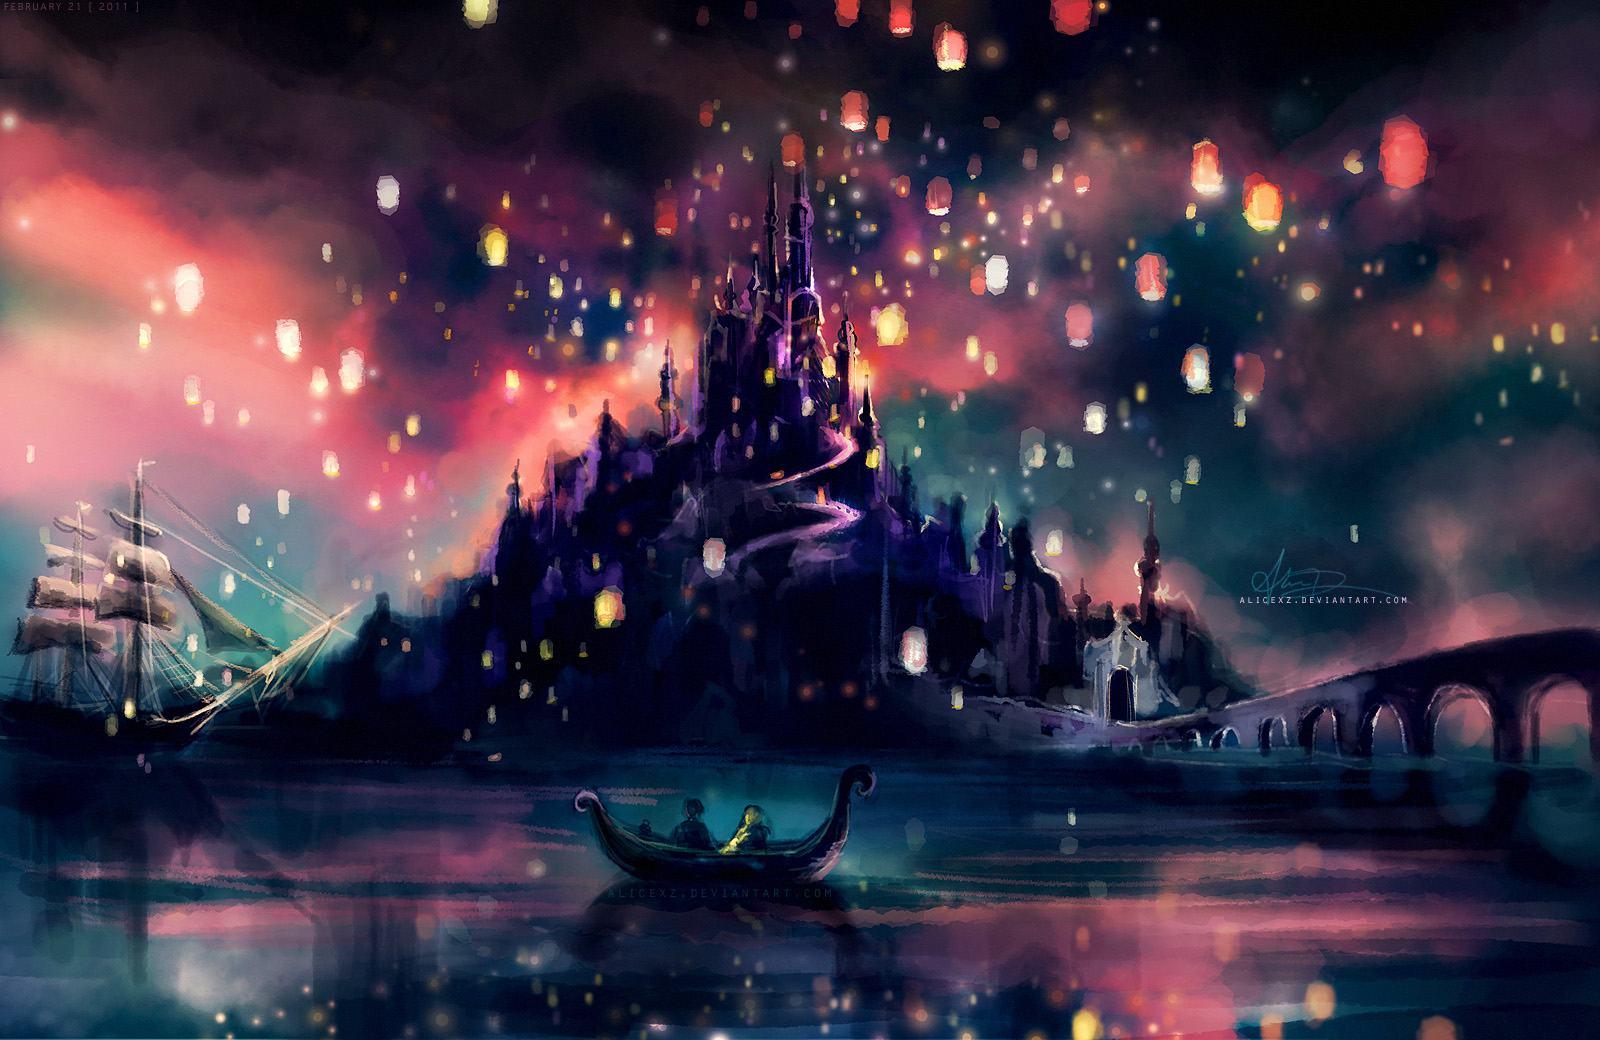 Disney Tangled Wallpapers - Wallpaper Cave